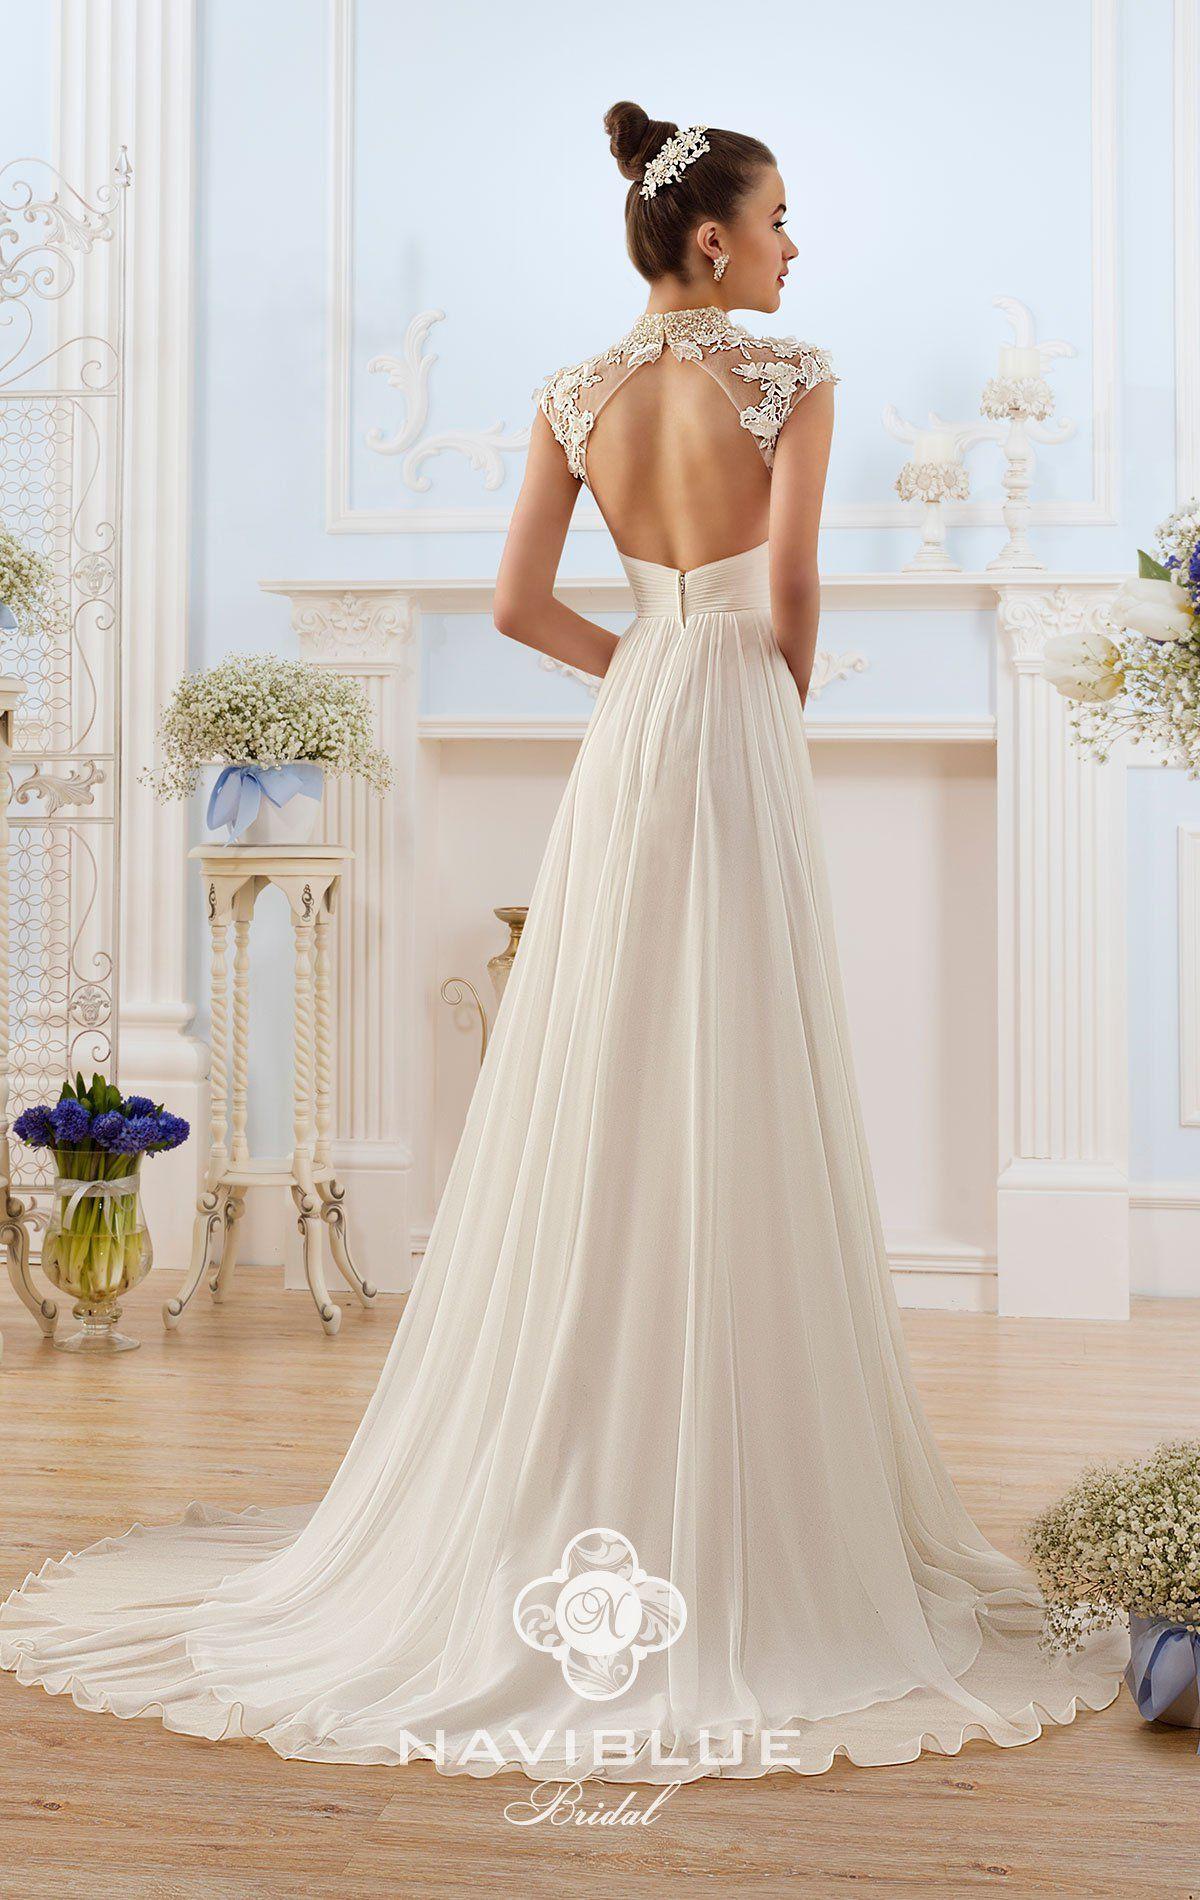 Hochzeitskleid leipzig